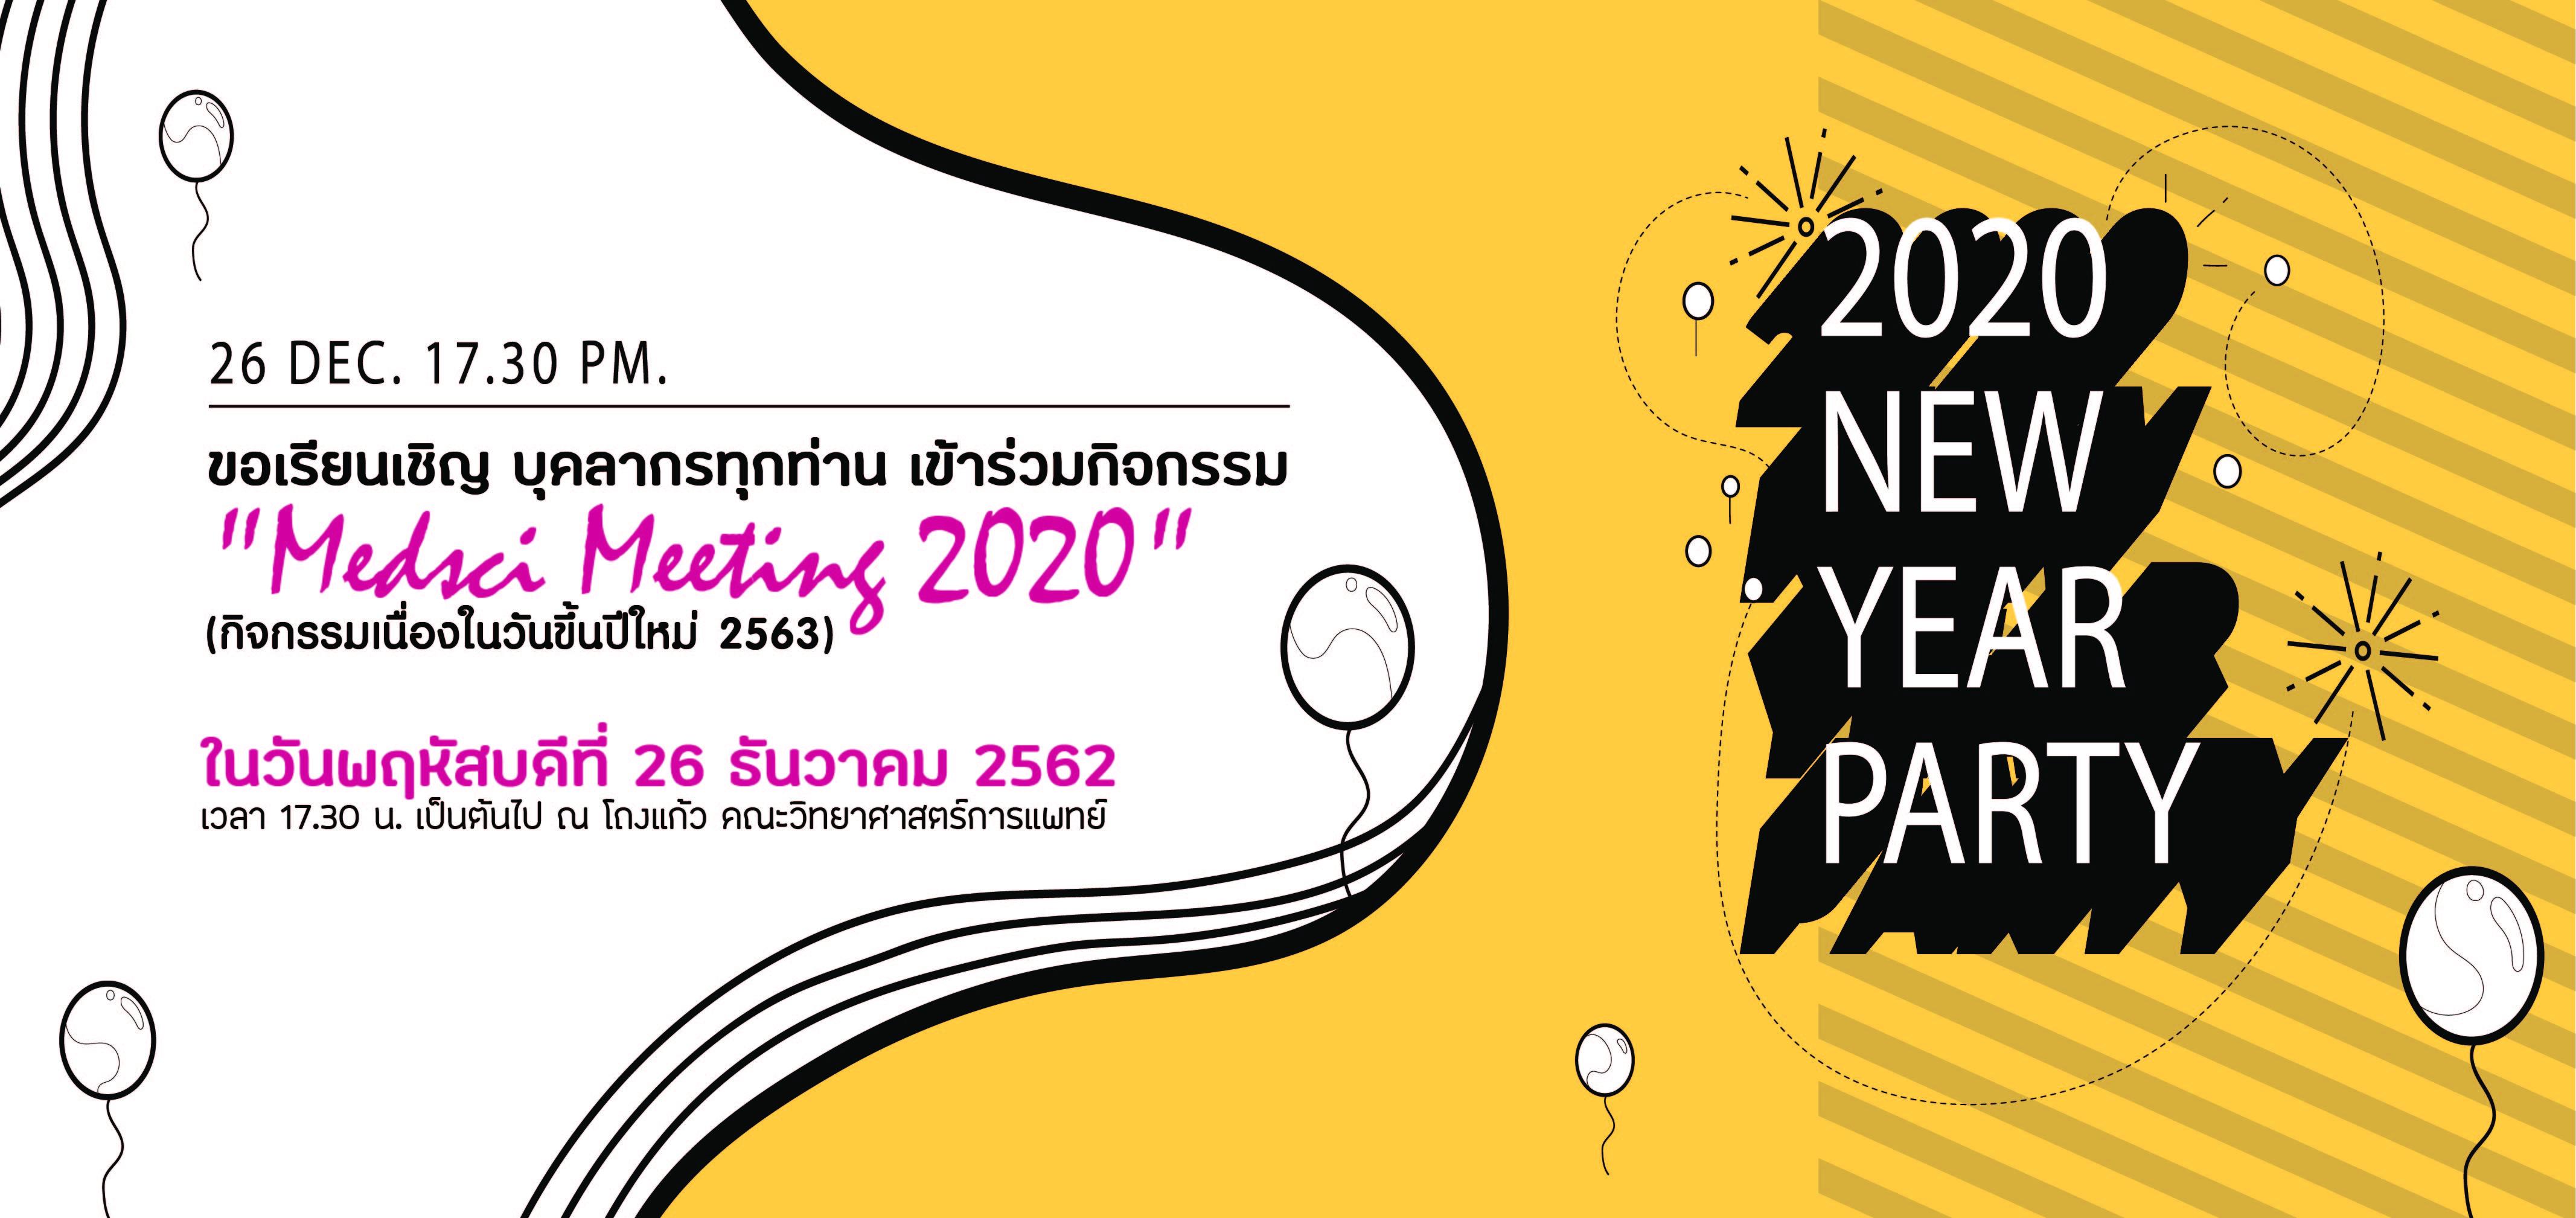 """Medsci Meeting 2020"" (กิจกรรมเนื่องในวันขึ้นปีใหม่ 2563)"